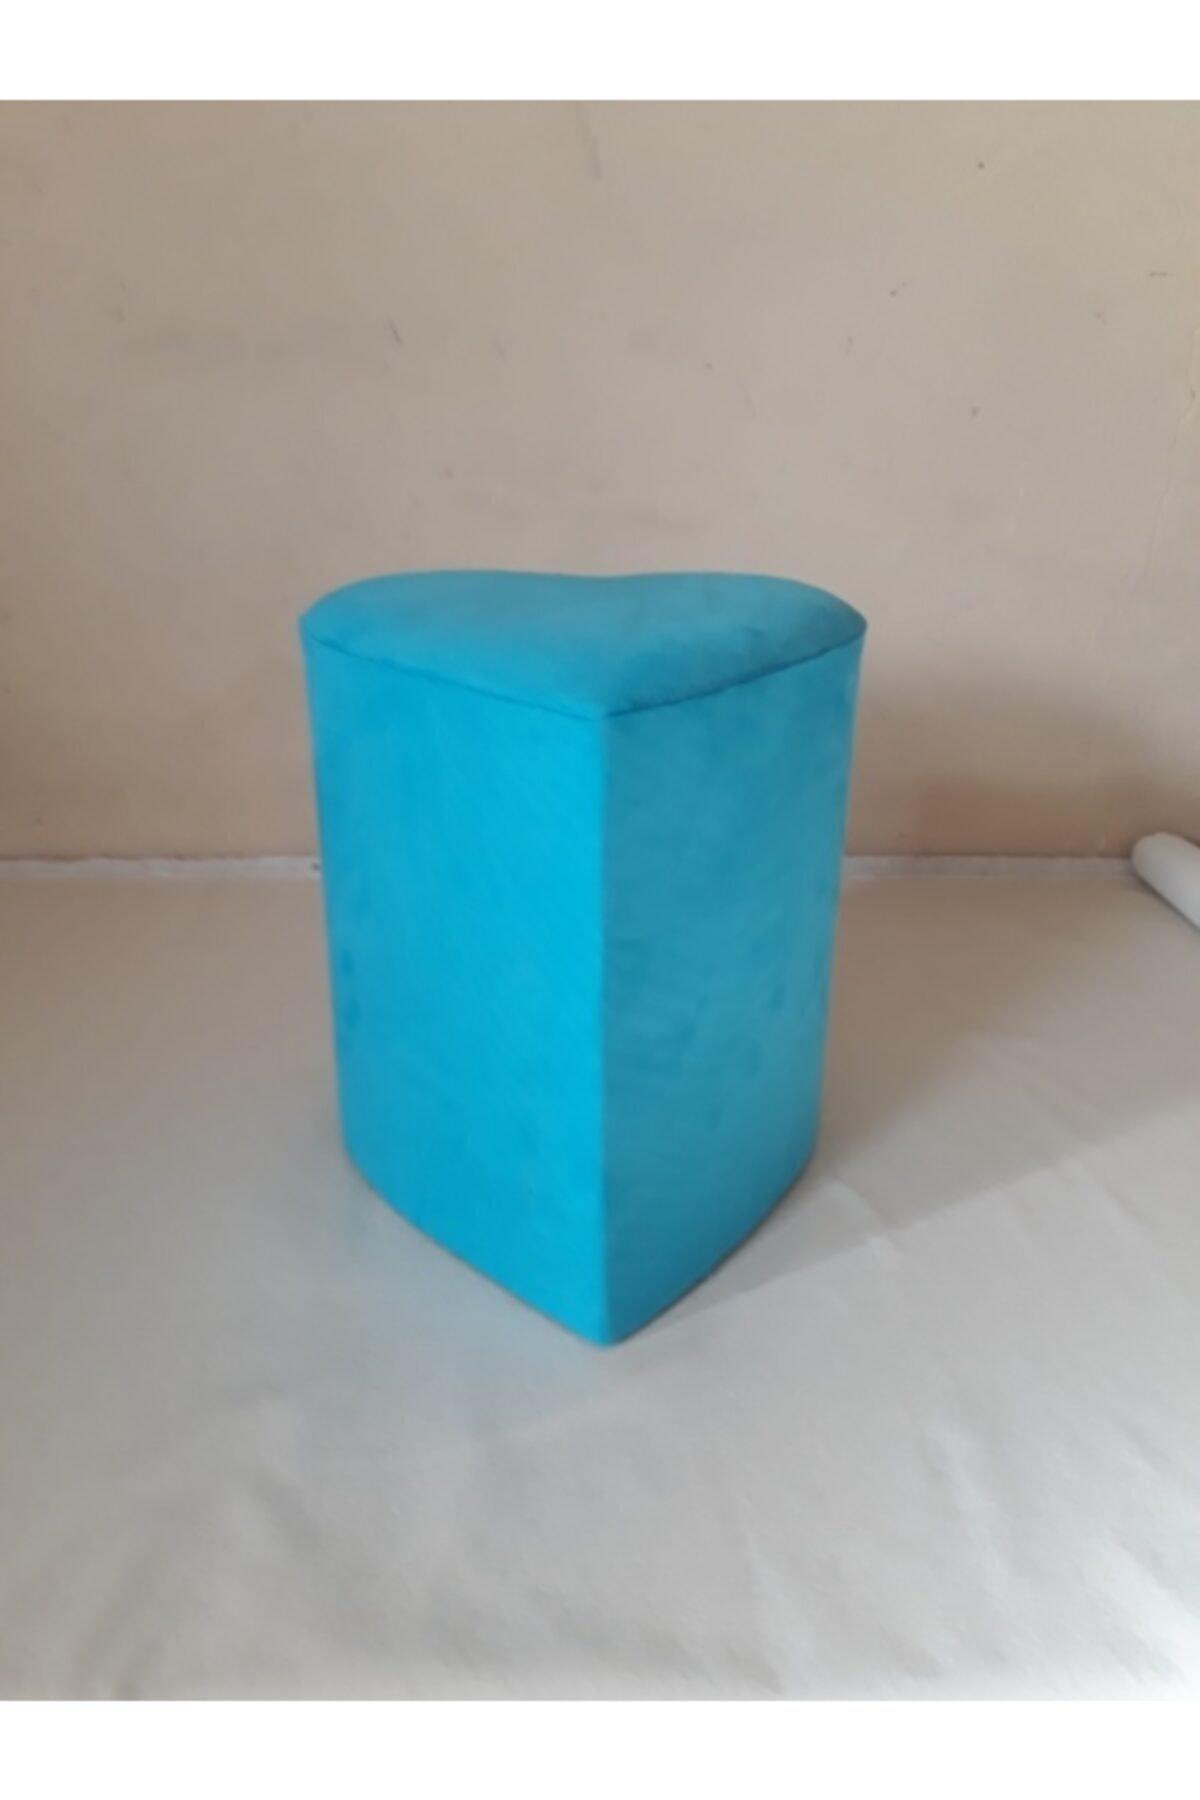 Ne-sil Kanepe & Tekstil Silinebilir Kumaş Kalpli Puf Turkuaz Renk 1